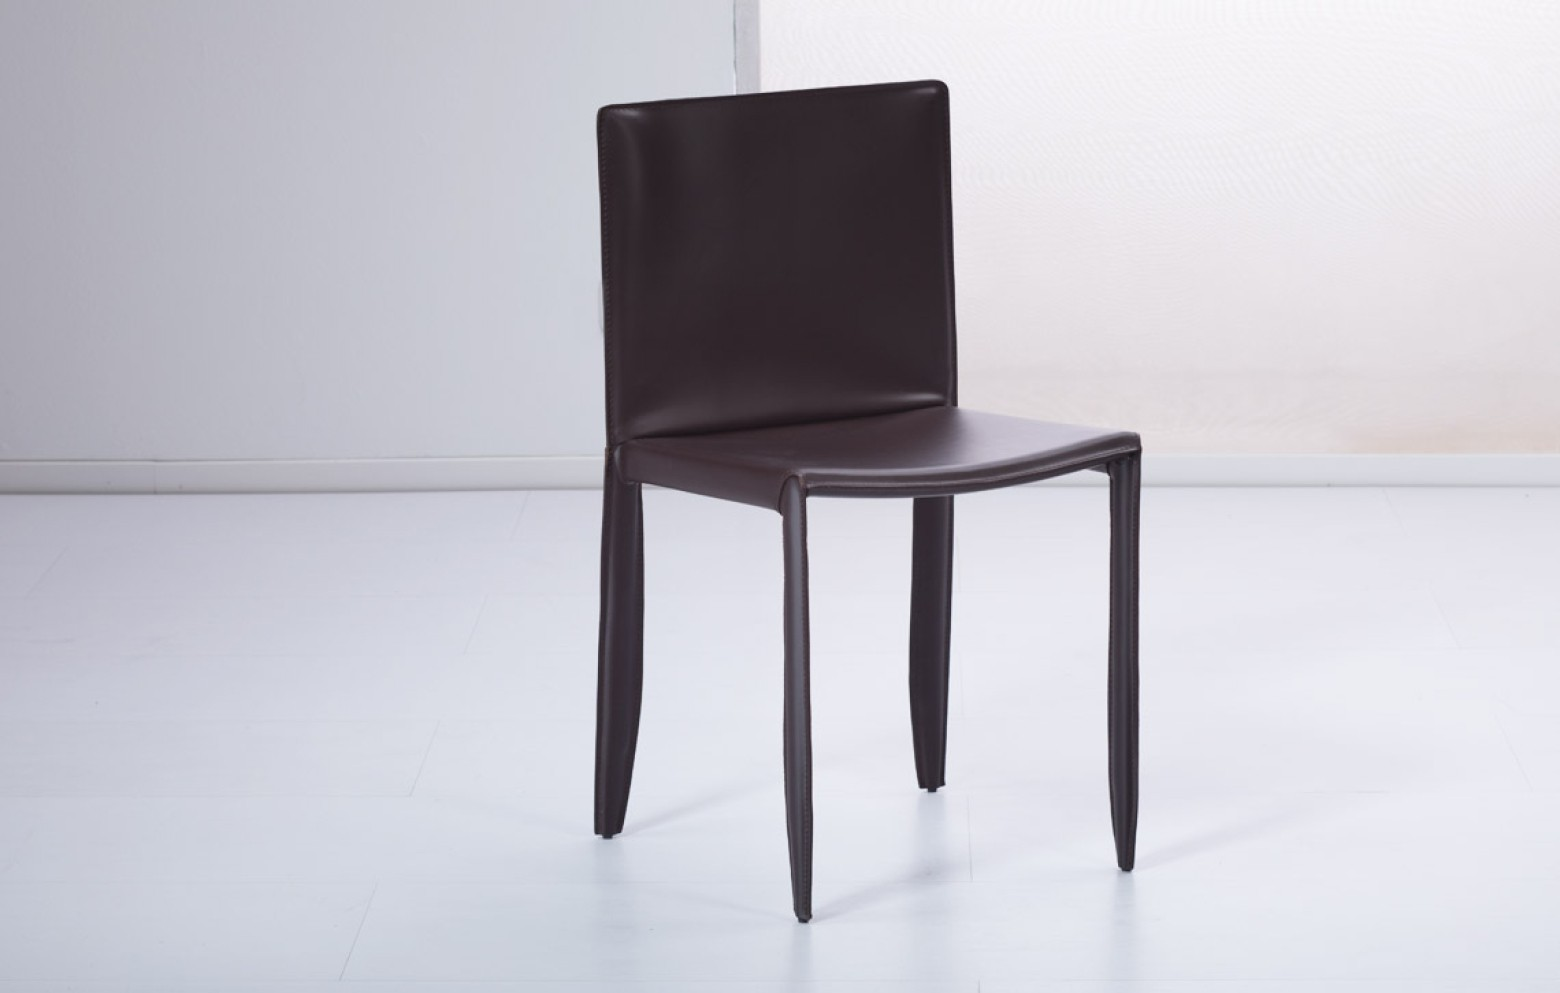 luna st hle tische st hle who 39 s perfect. Black Bedroom Furniture Sets. Home Design Ideas